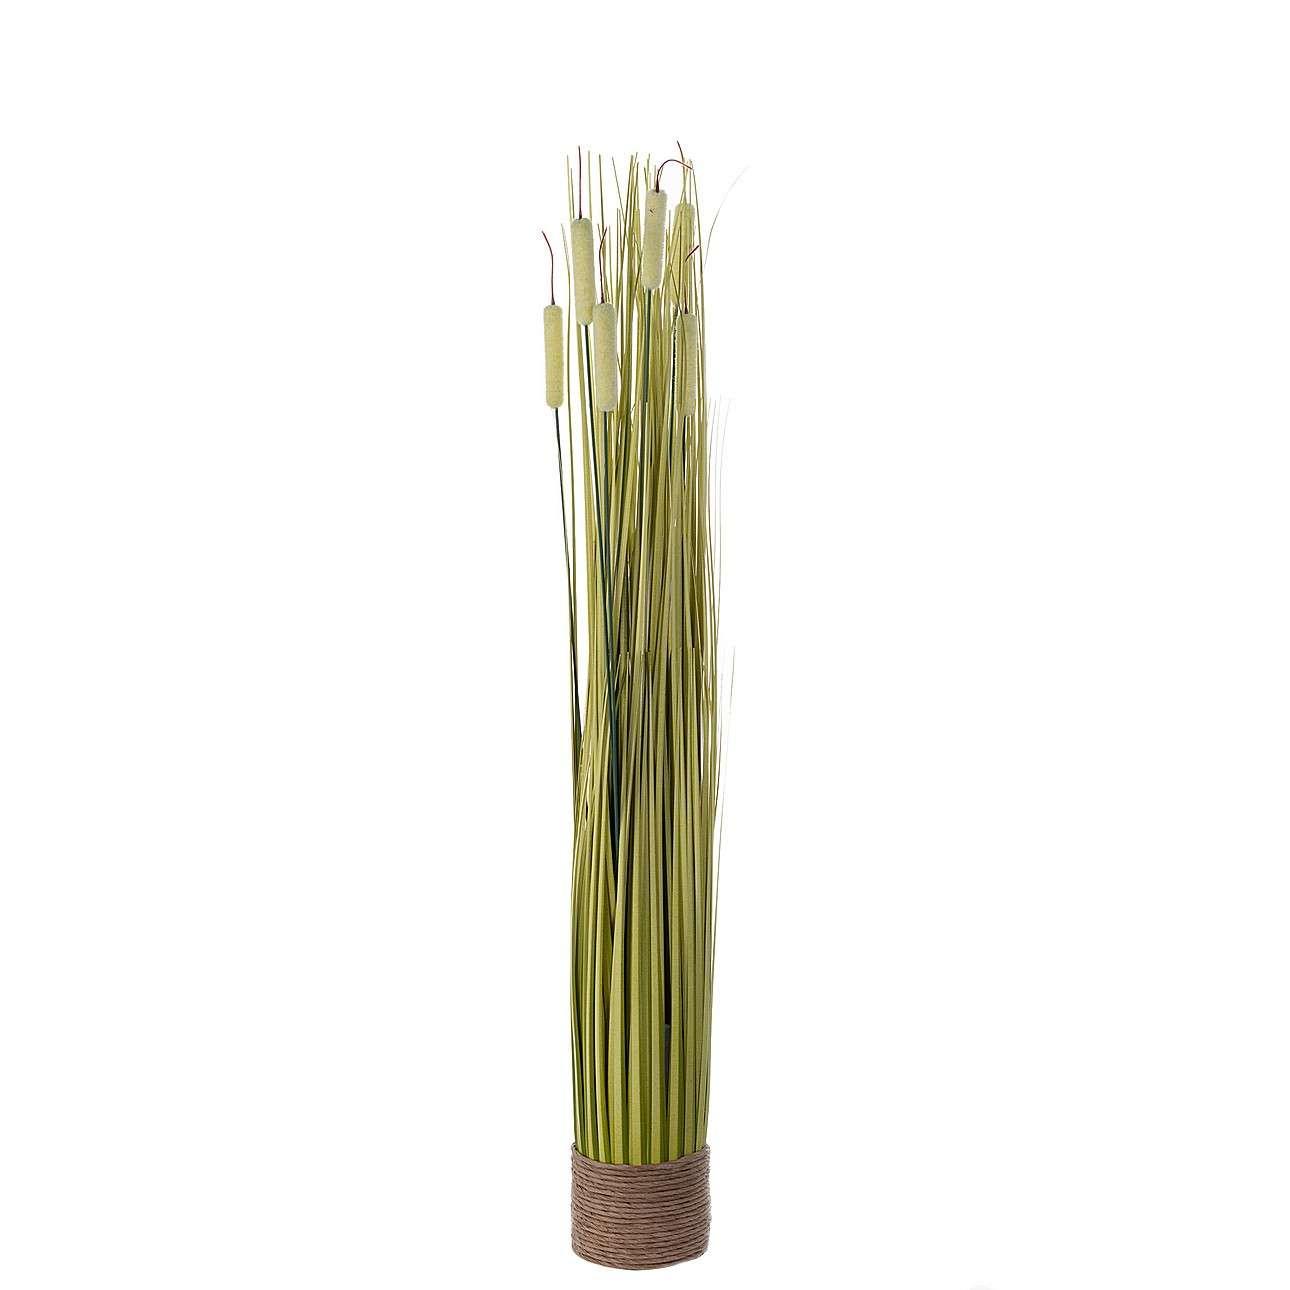 Rostlinná dekorace Grass II výška 83cm